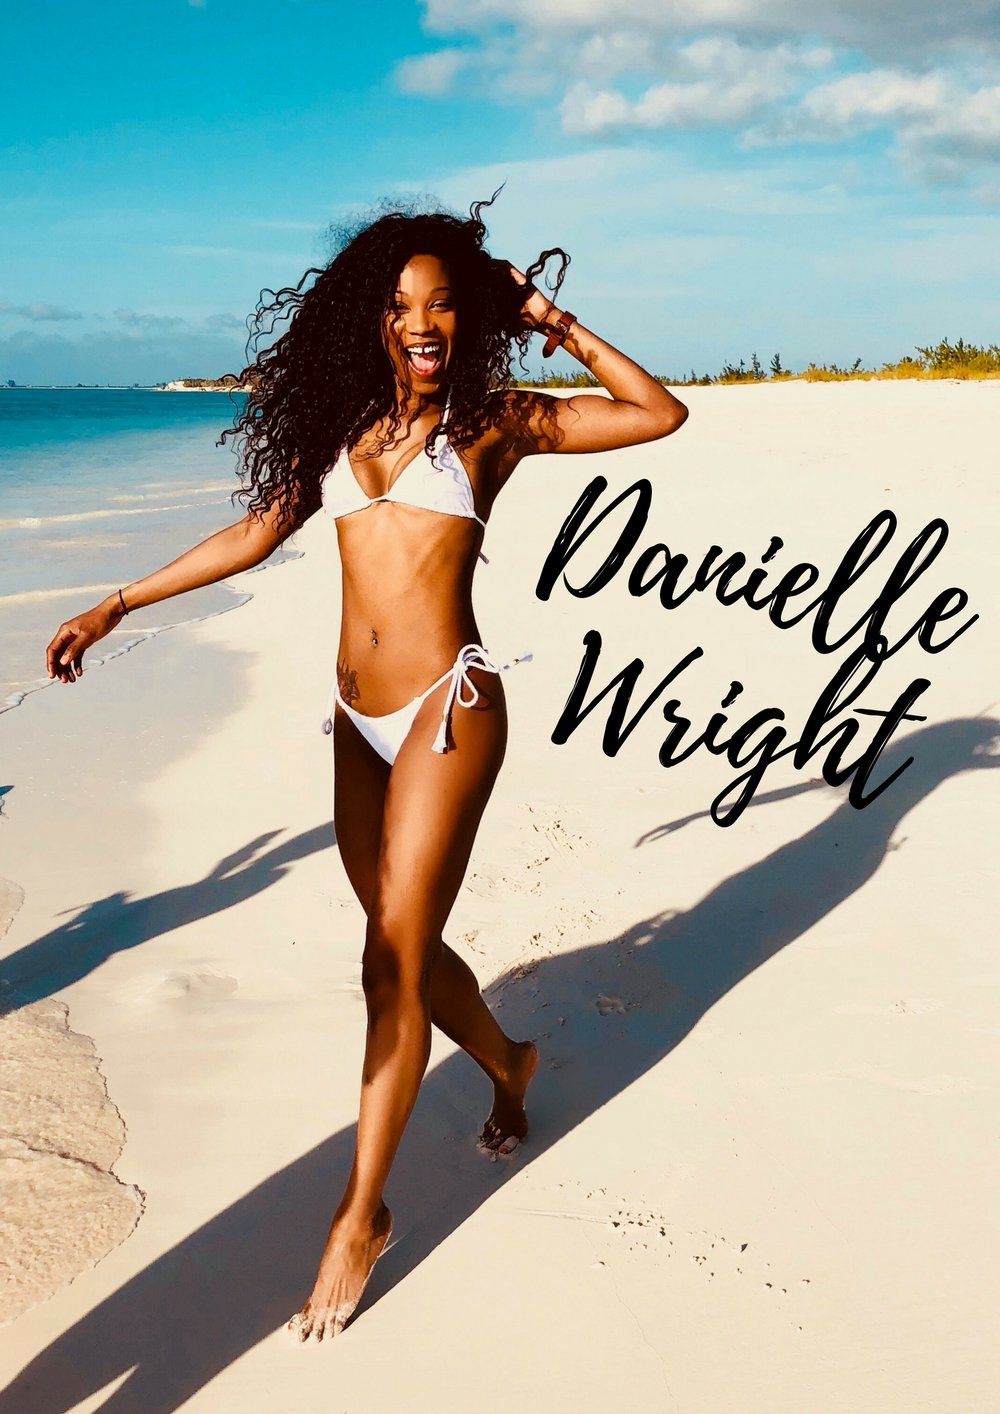 Danielle Wright.jpg